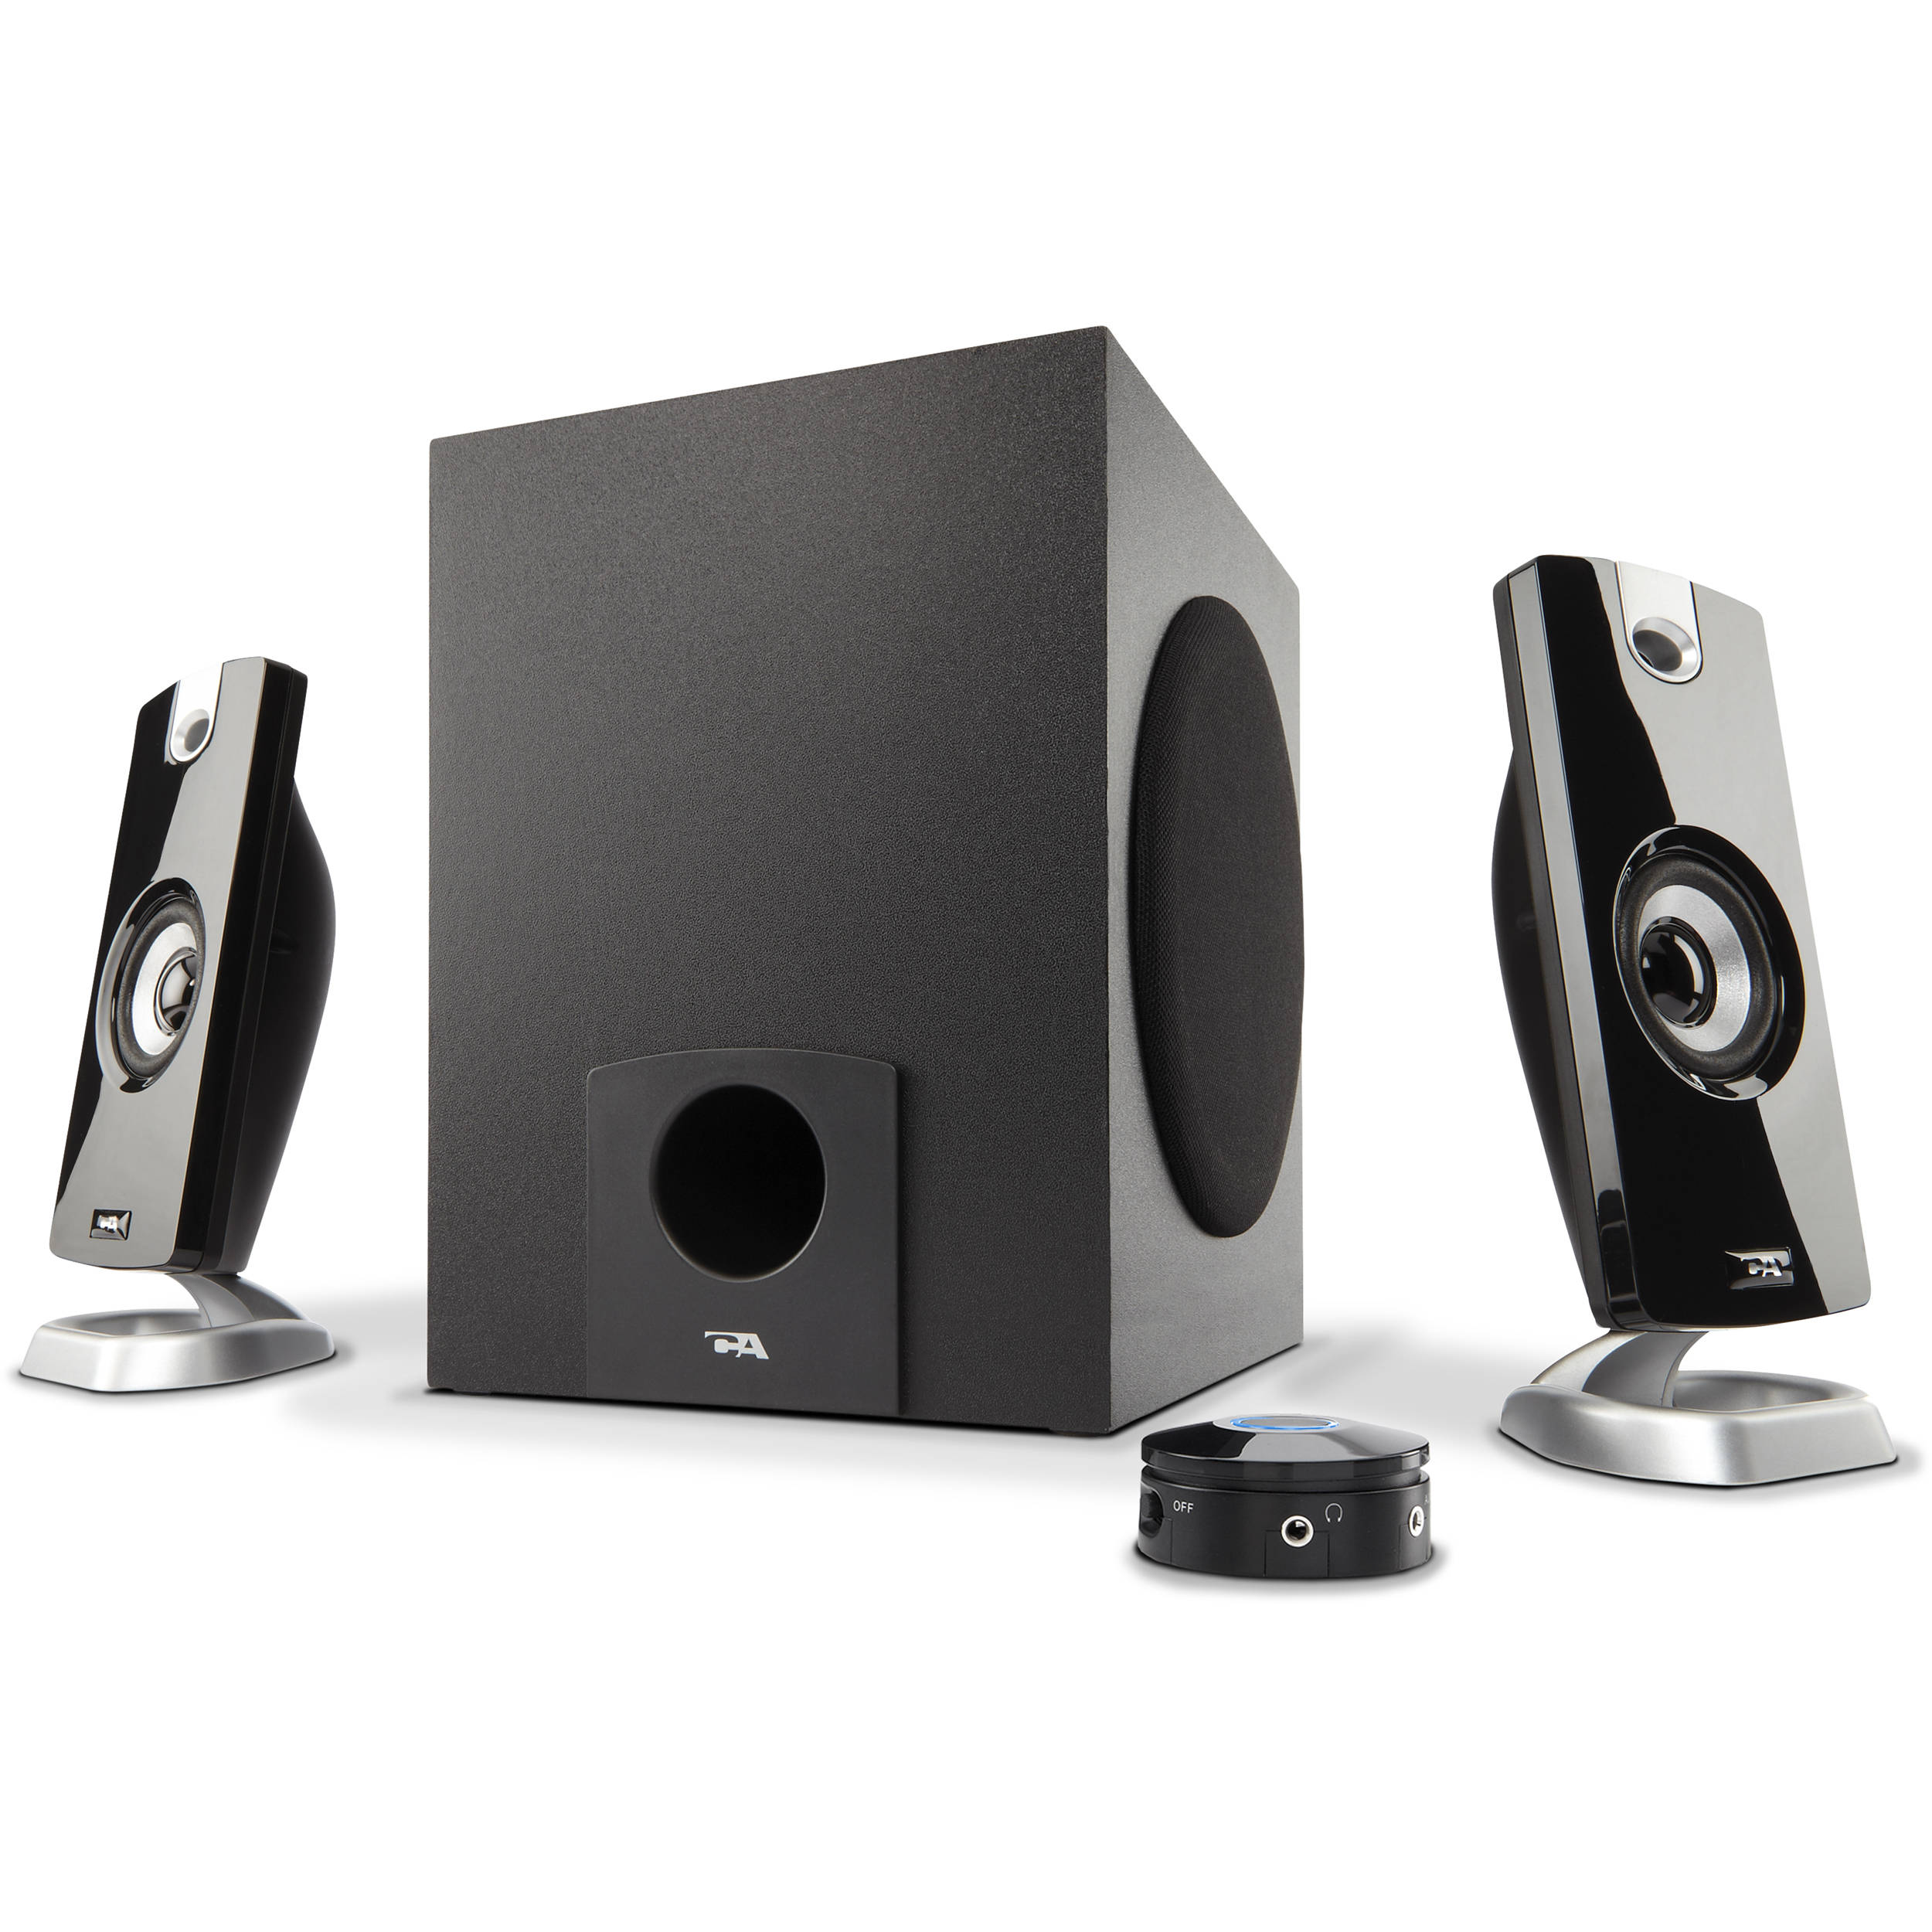 Cyber Acoustics CA-3090 3-Piece Flat Panel Design Subwoofer & Satellite  Speaker System